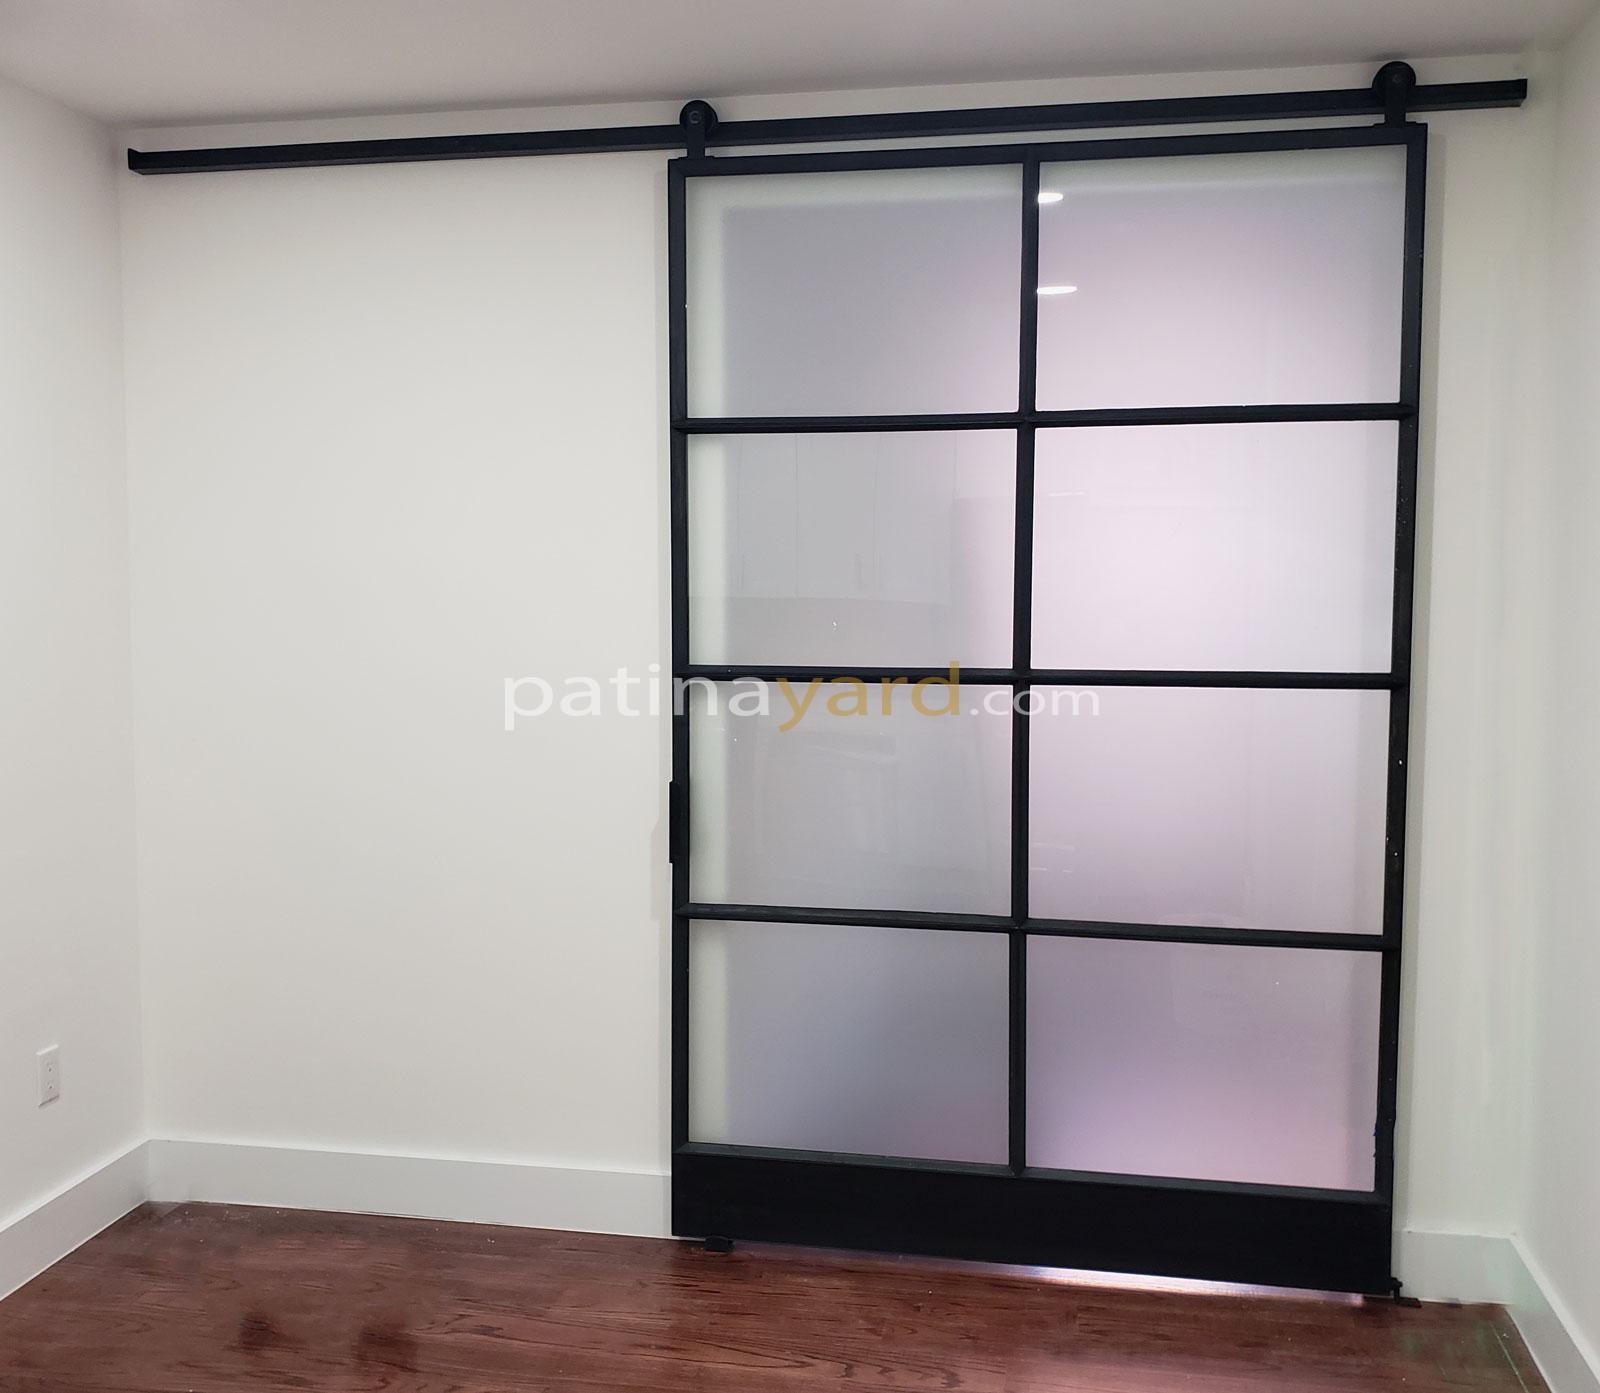 large single warehouse style with satin glass finish